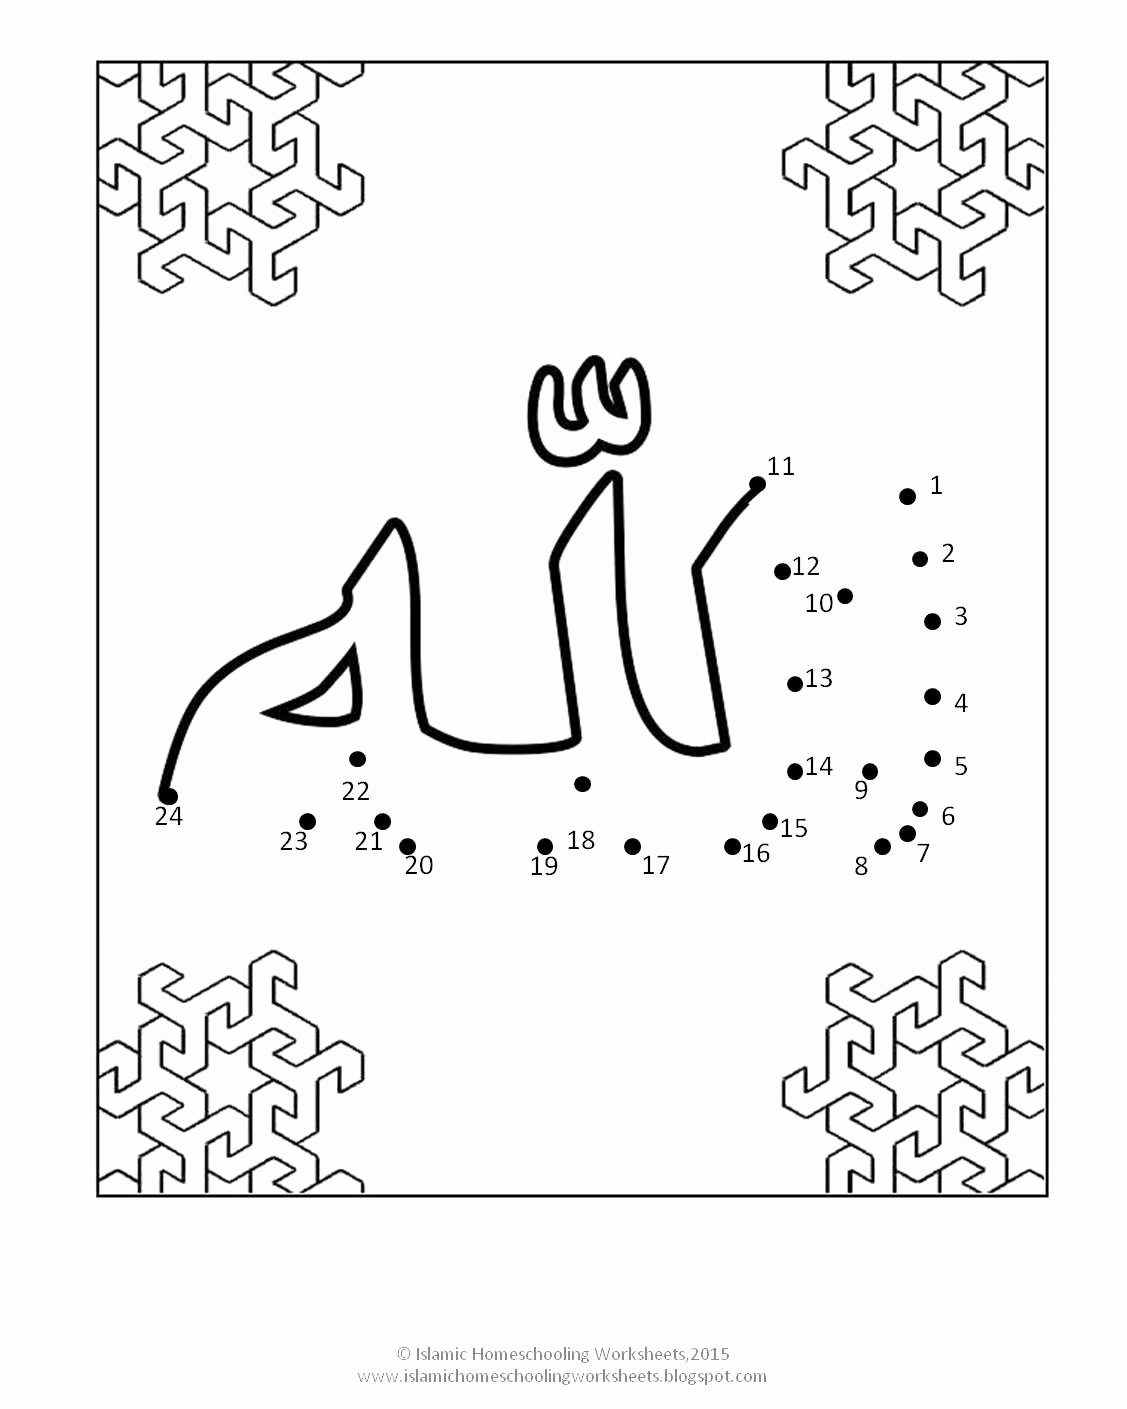 Islamic Worksheets for Preschoolers Fresh islamic Homeschooling Malaysia